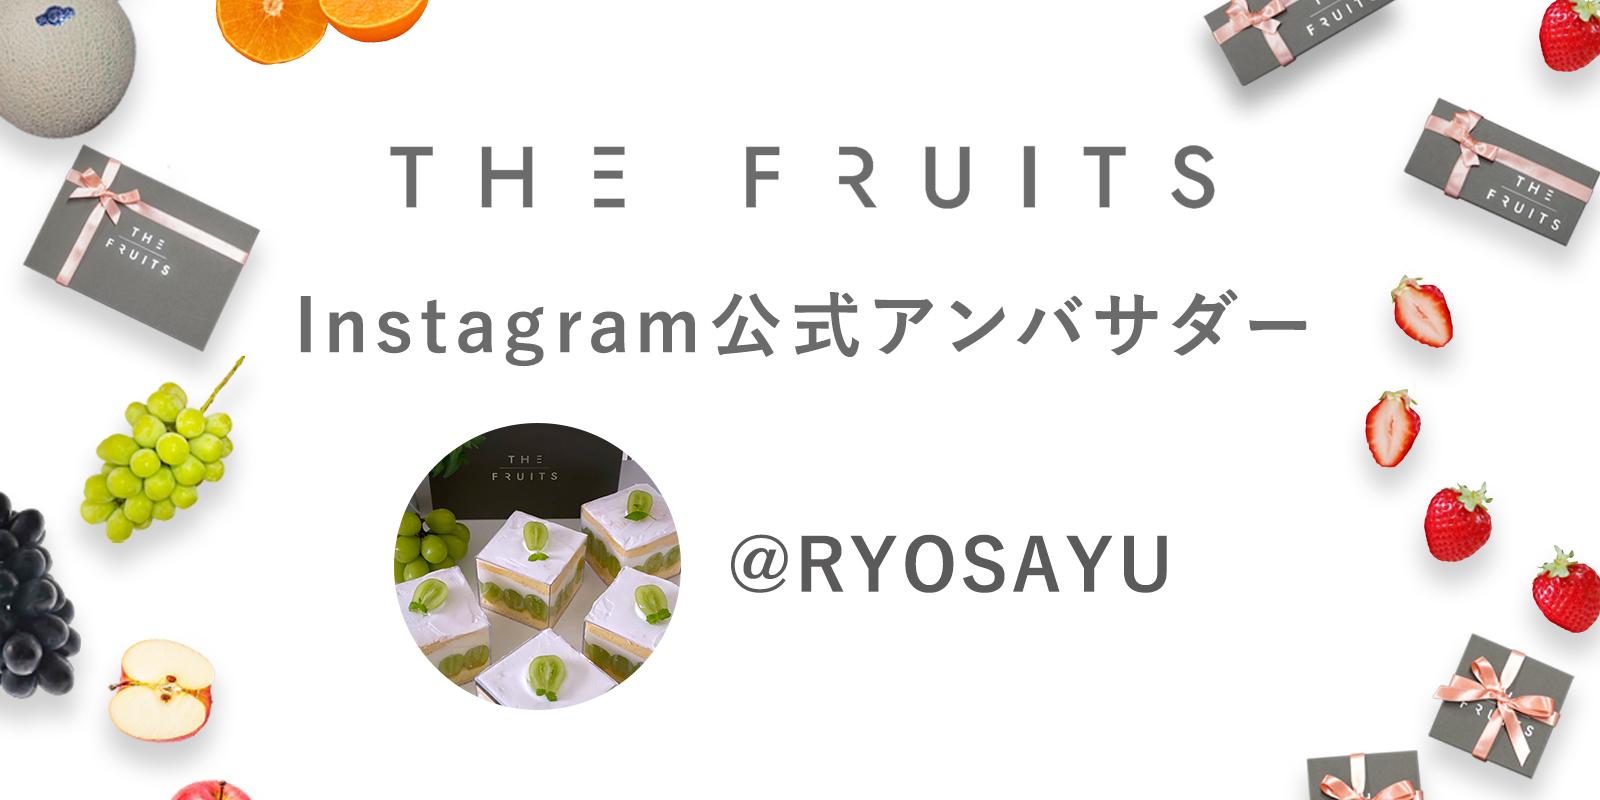 THE FRUITS公式アンバサダー就任のお知らせ @ryosayuのイメージ